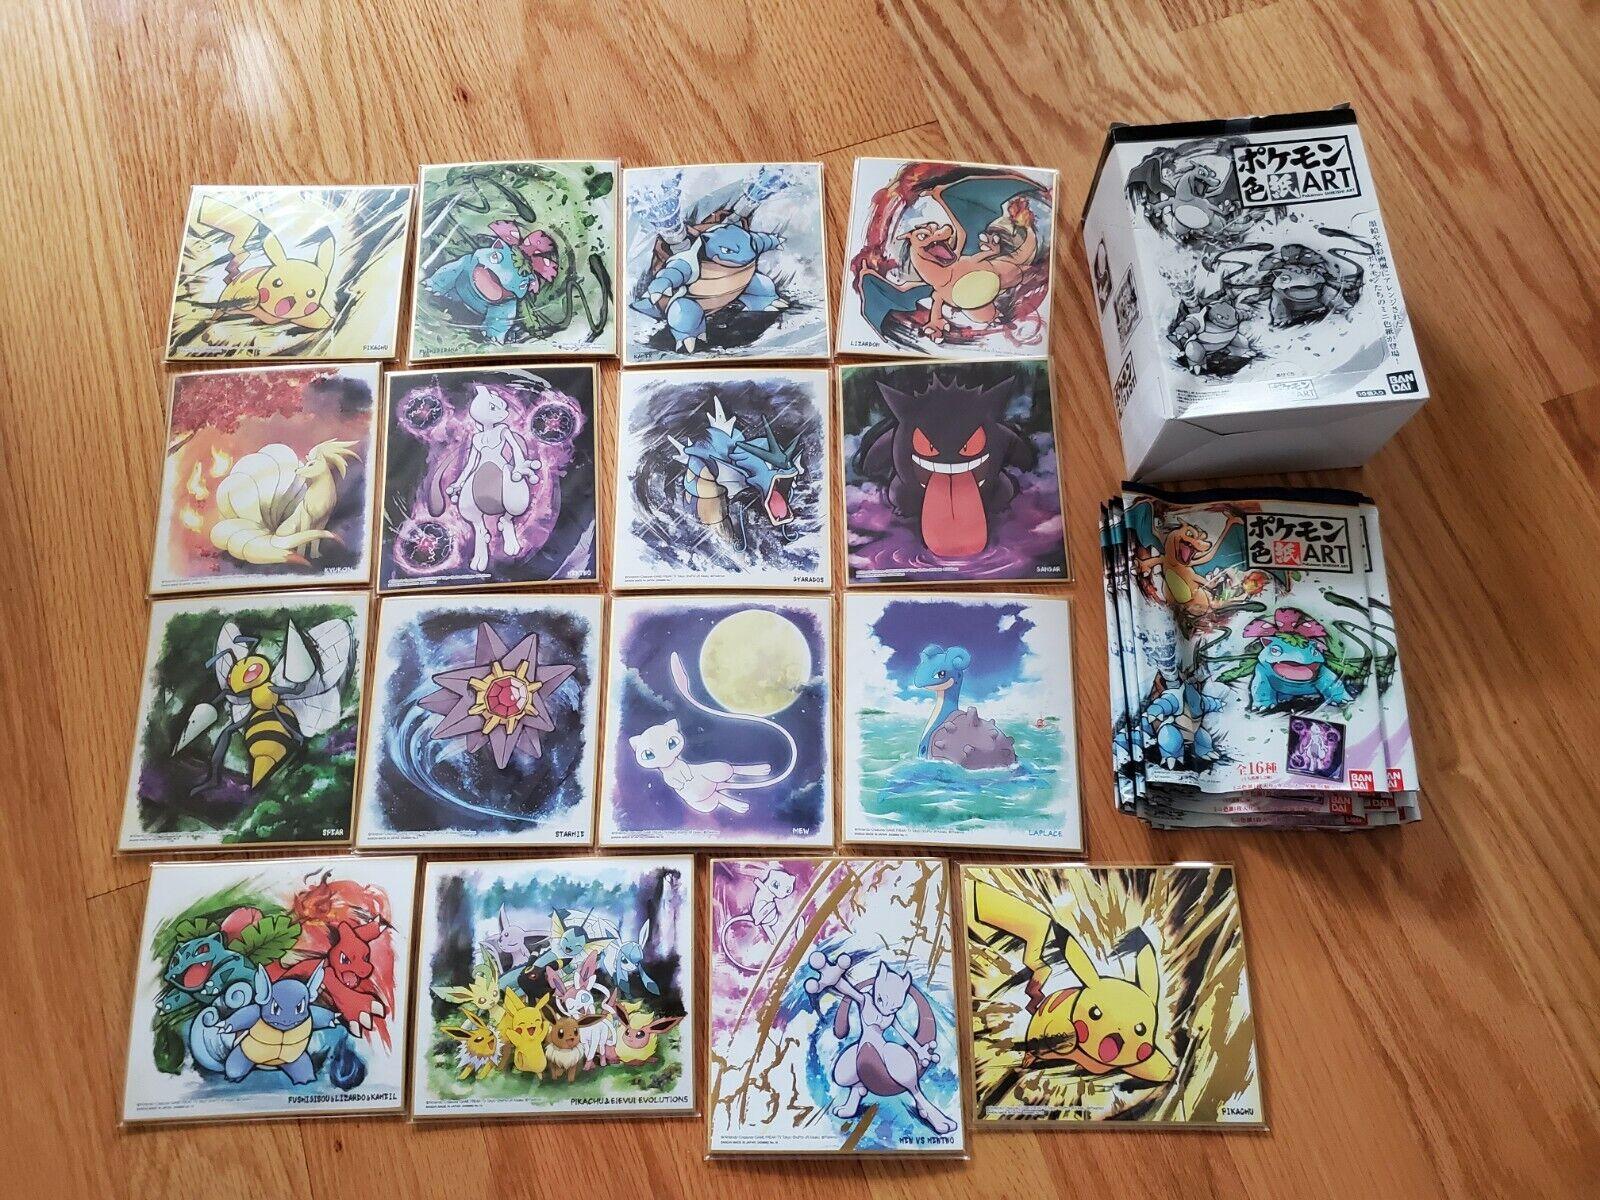 Pokemon Shikishi Art Series 1 Complete Set 16 Boards With Box Charizard